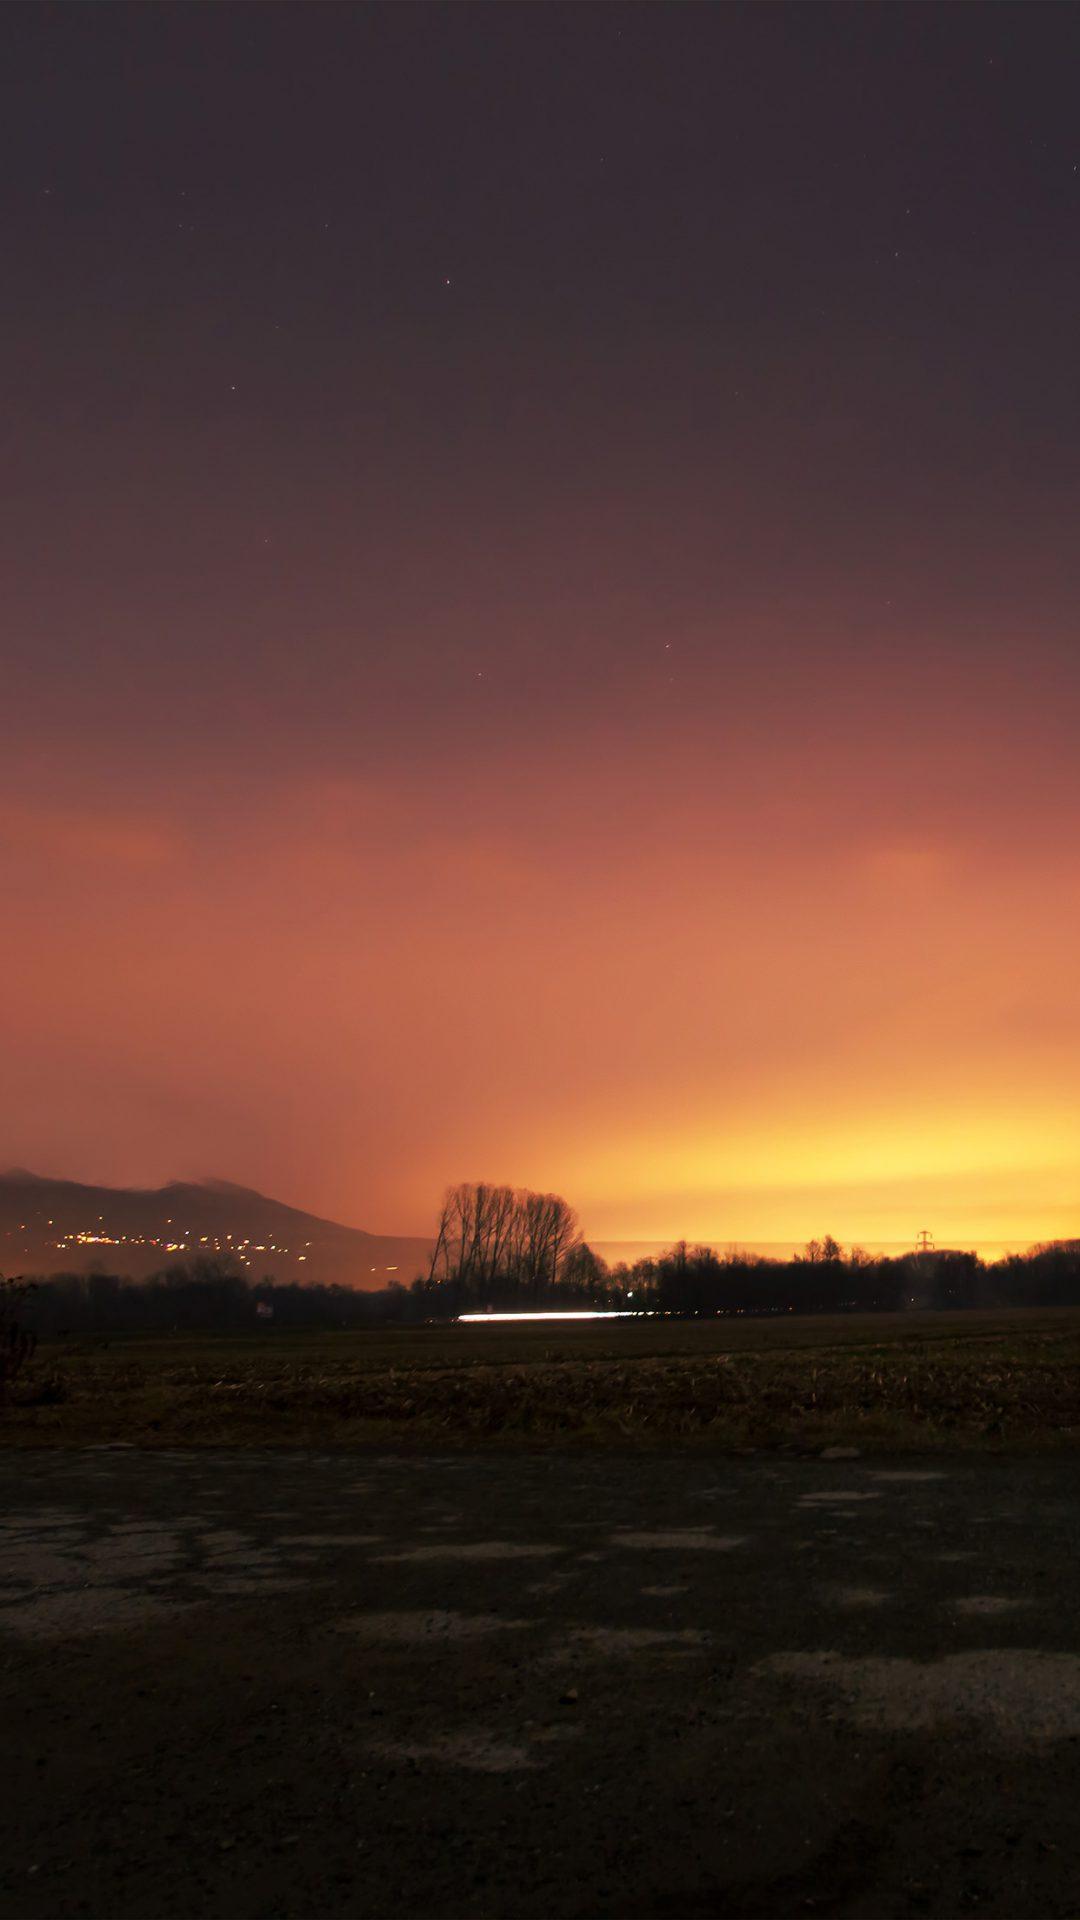 Dawn Nature Sky Sunset Mountain Red Dark